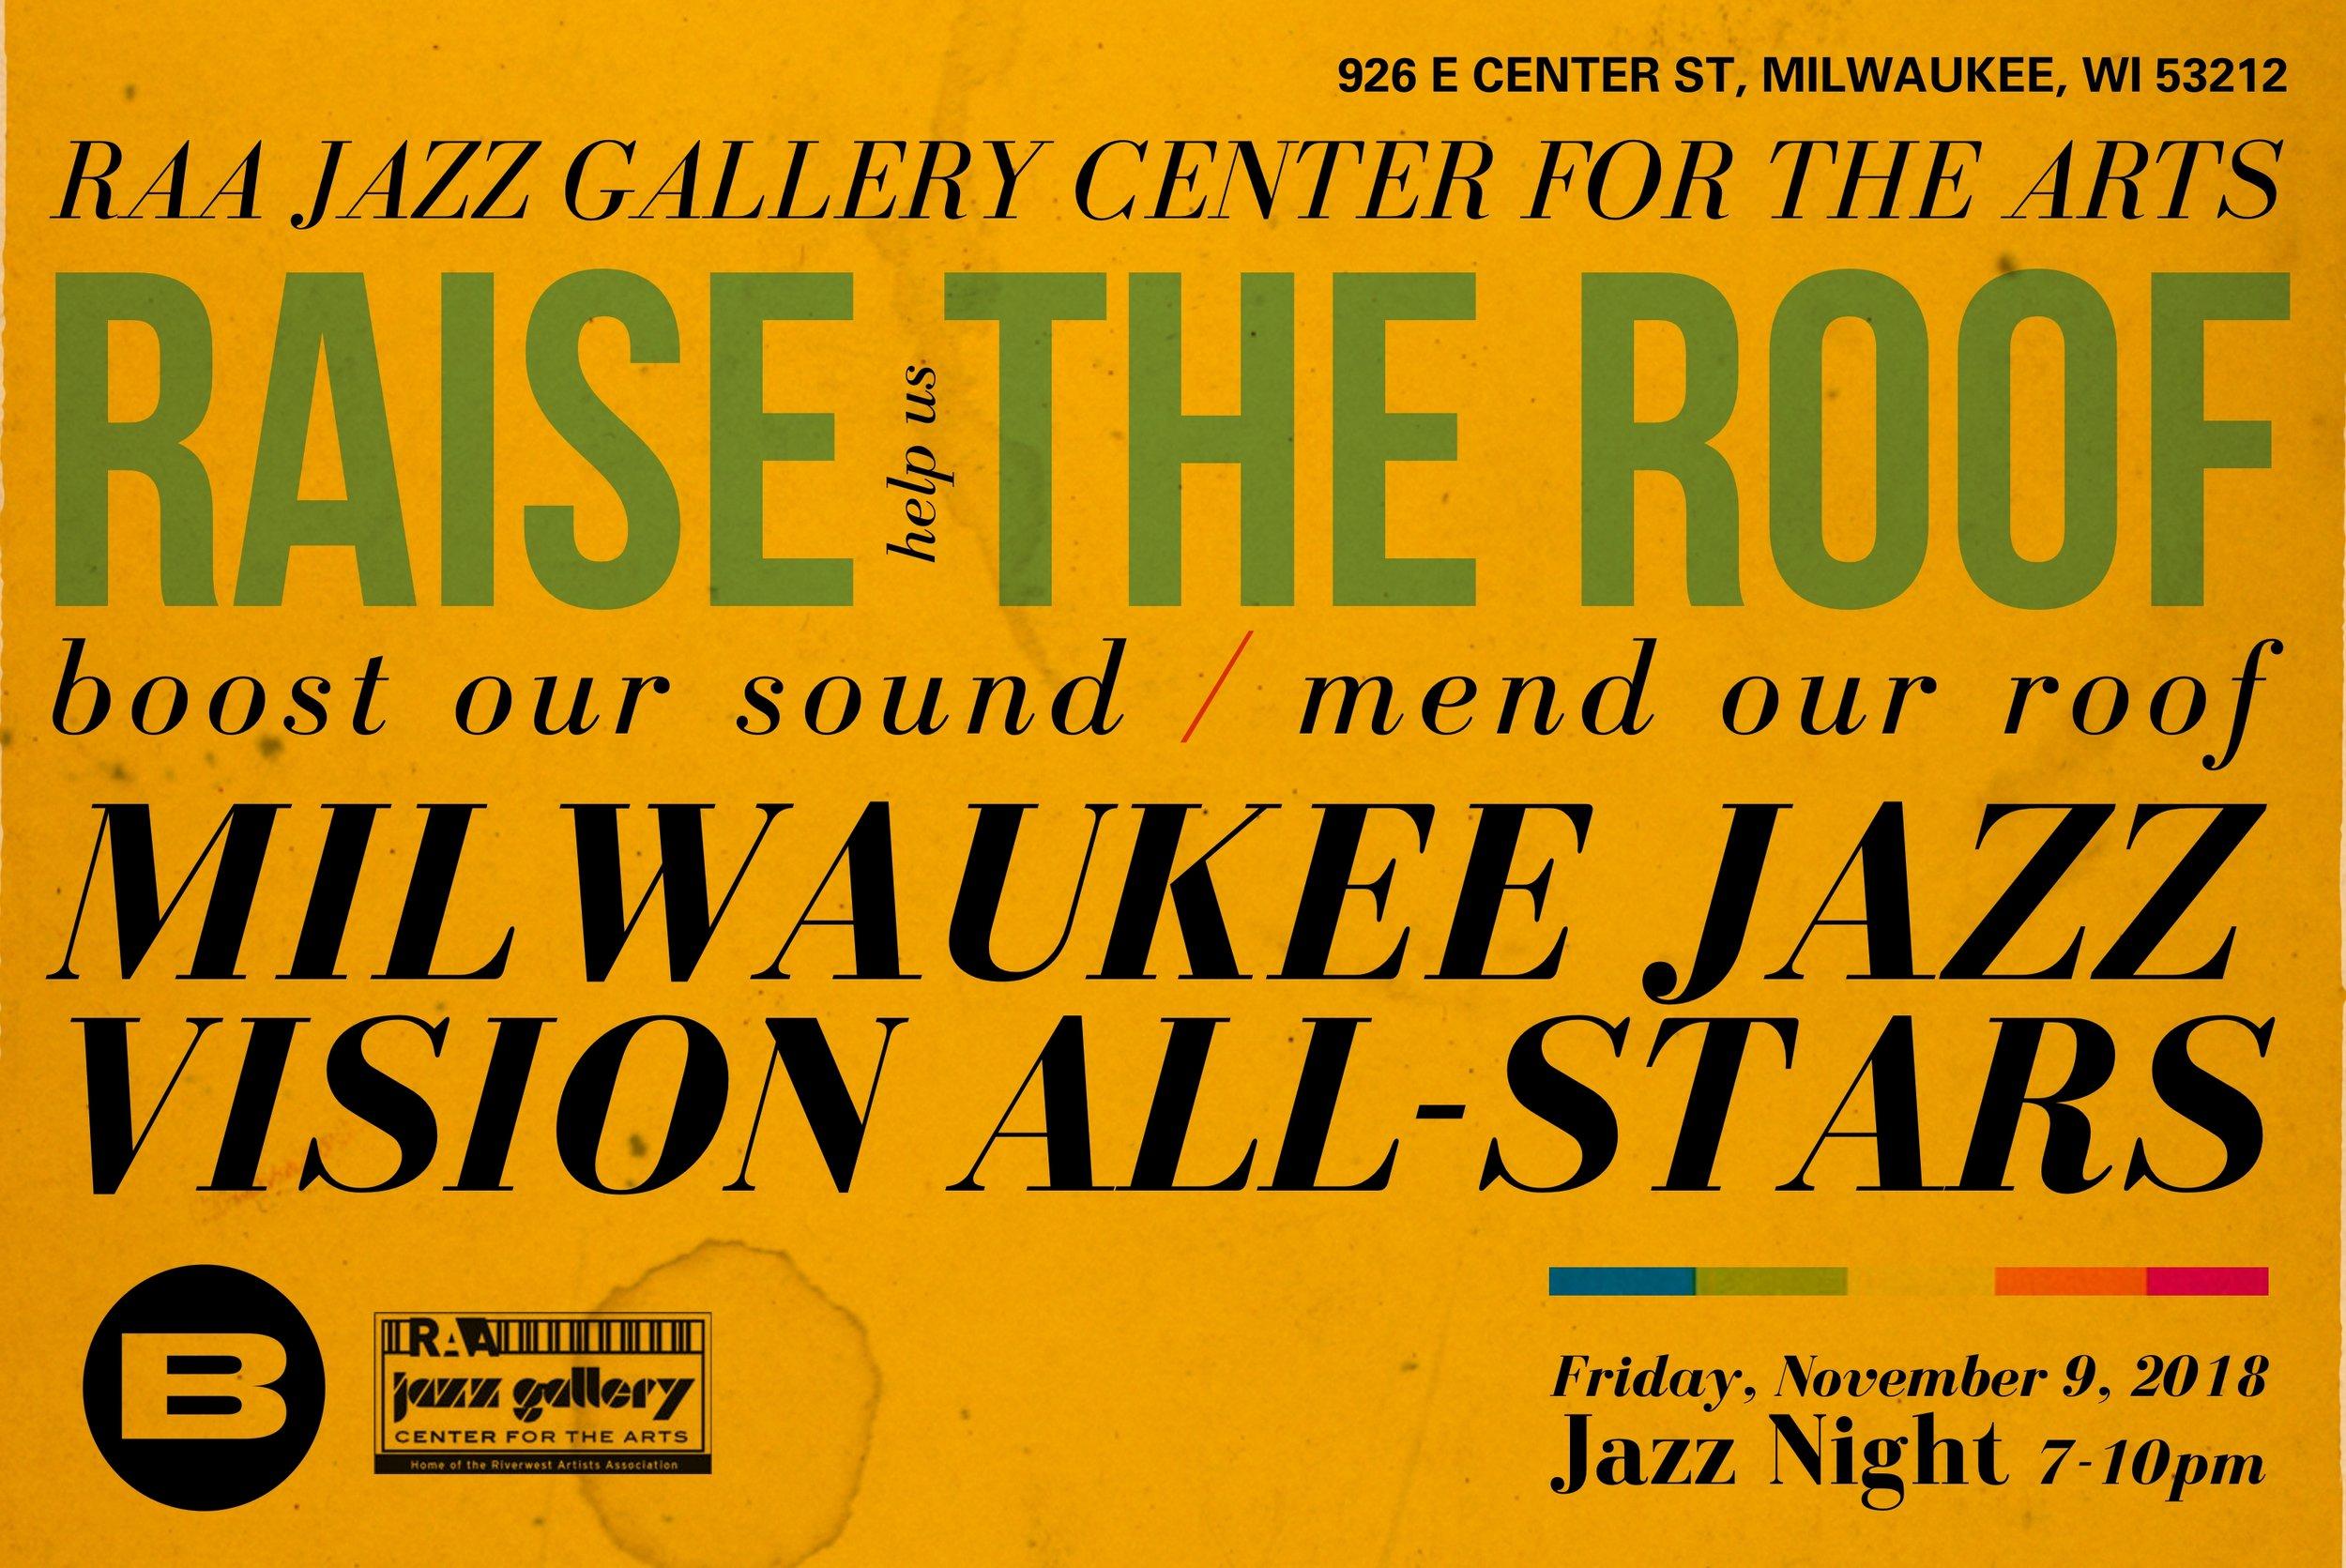 mke jazz allstars nov 9 jg_raisetheroof   .jpg